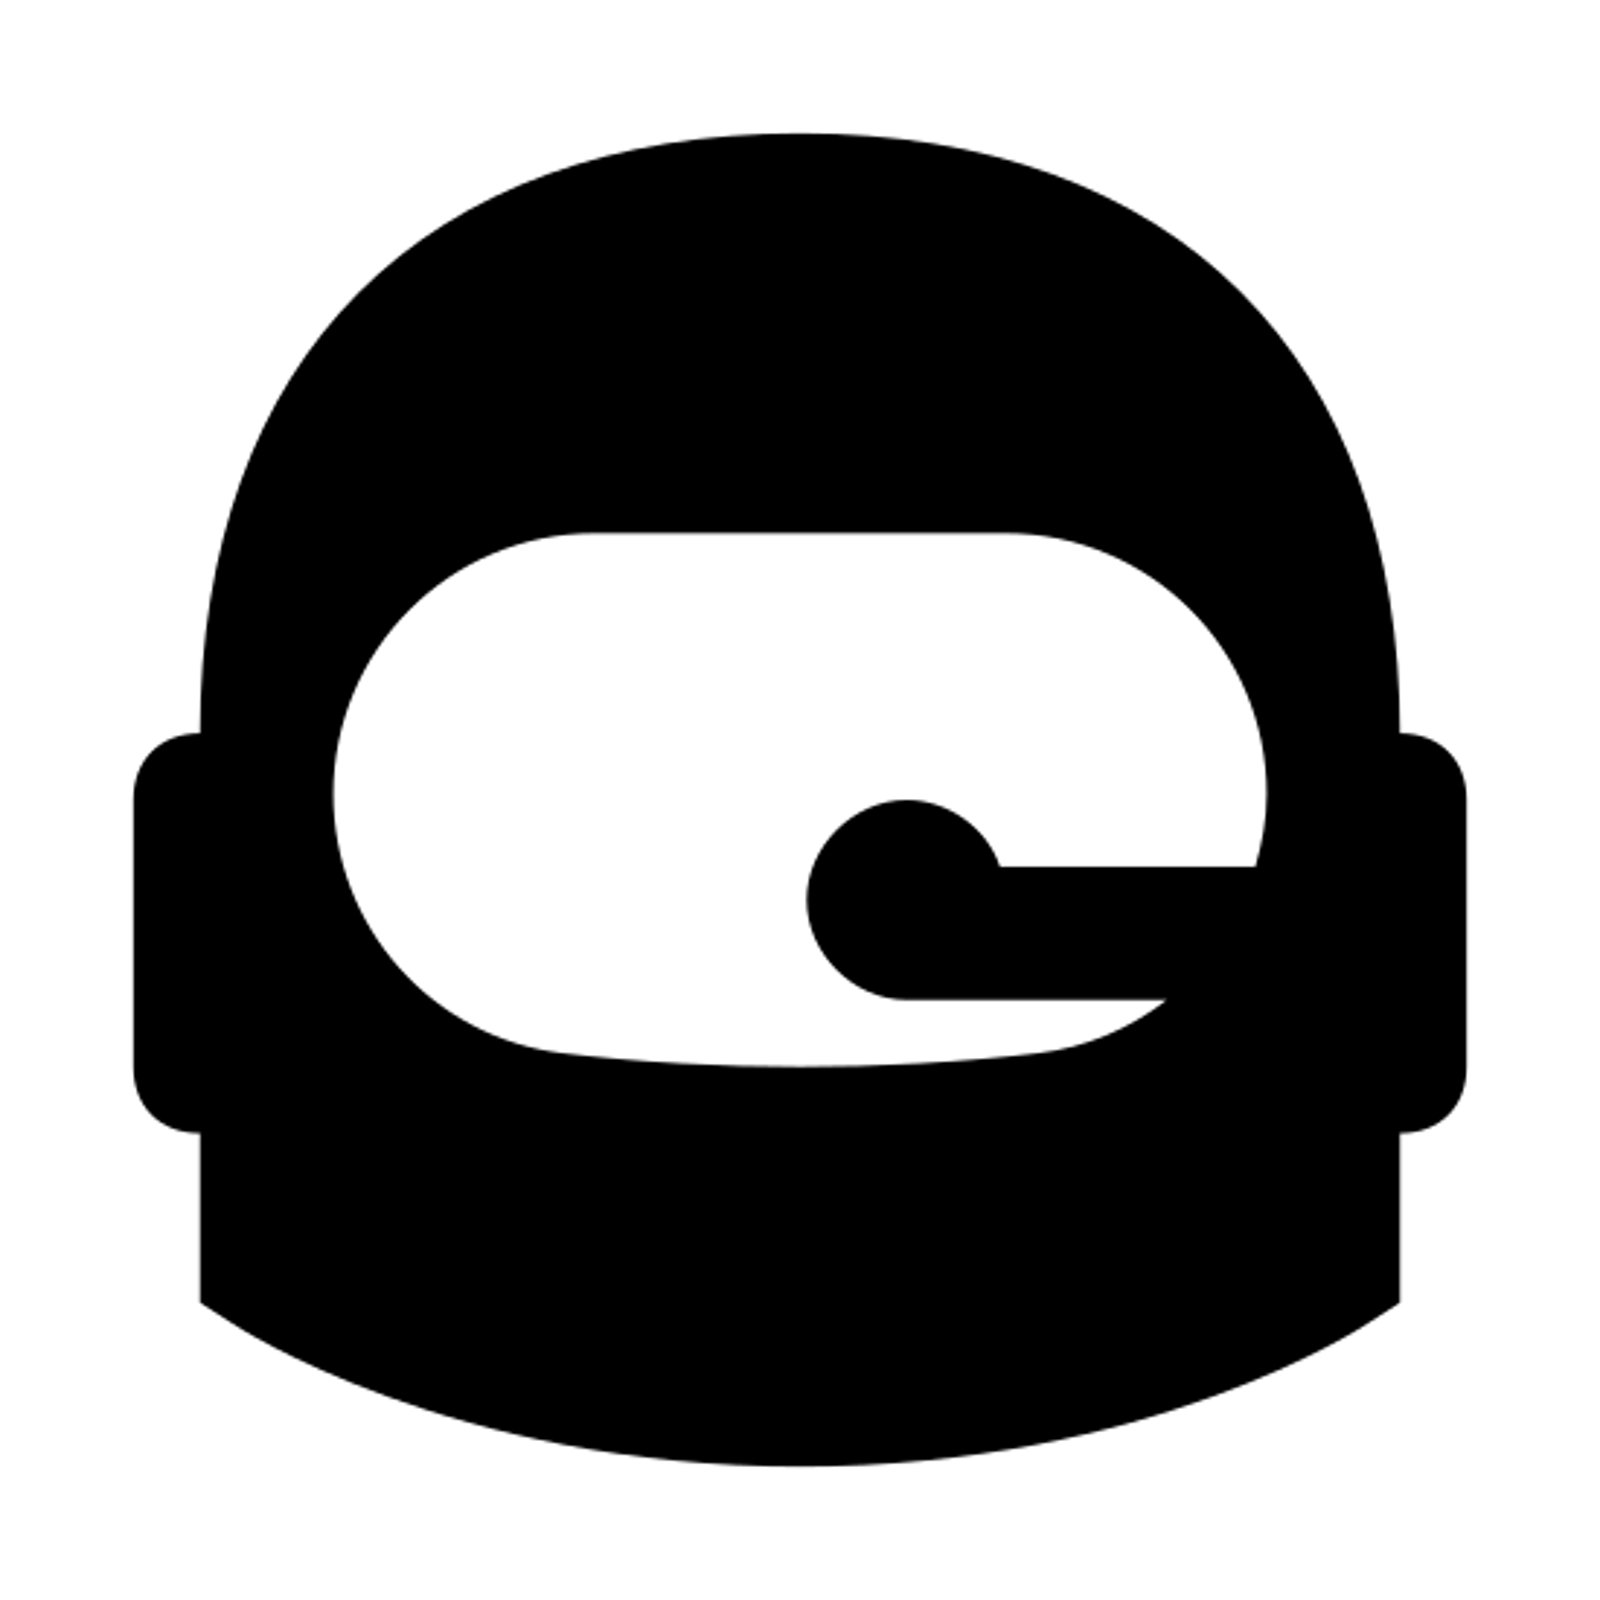 Astronauta Kask icon